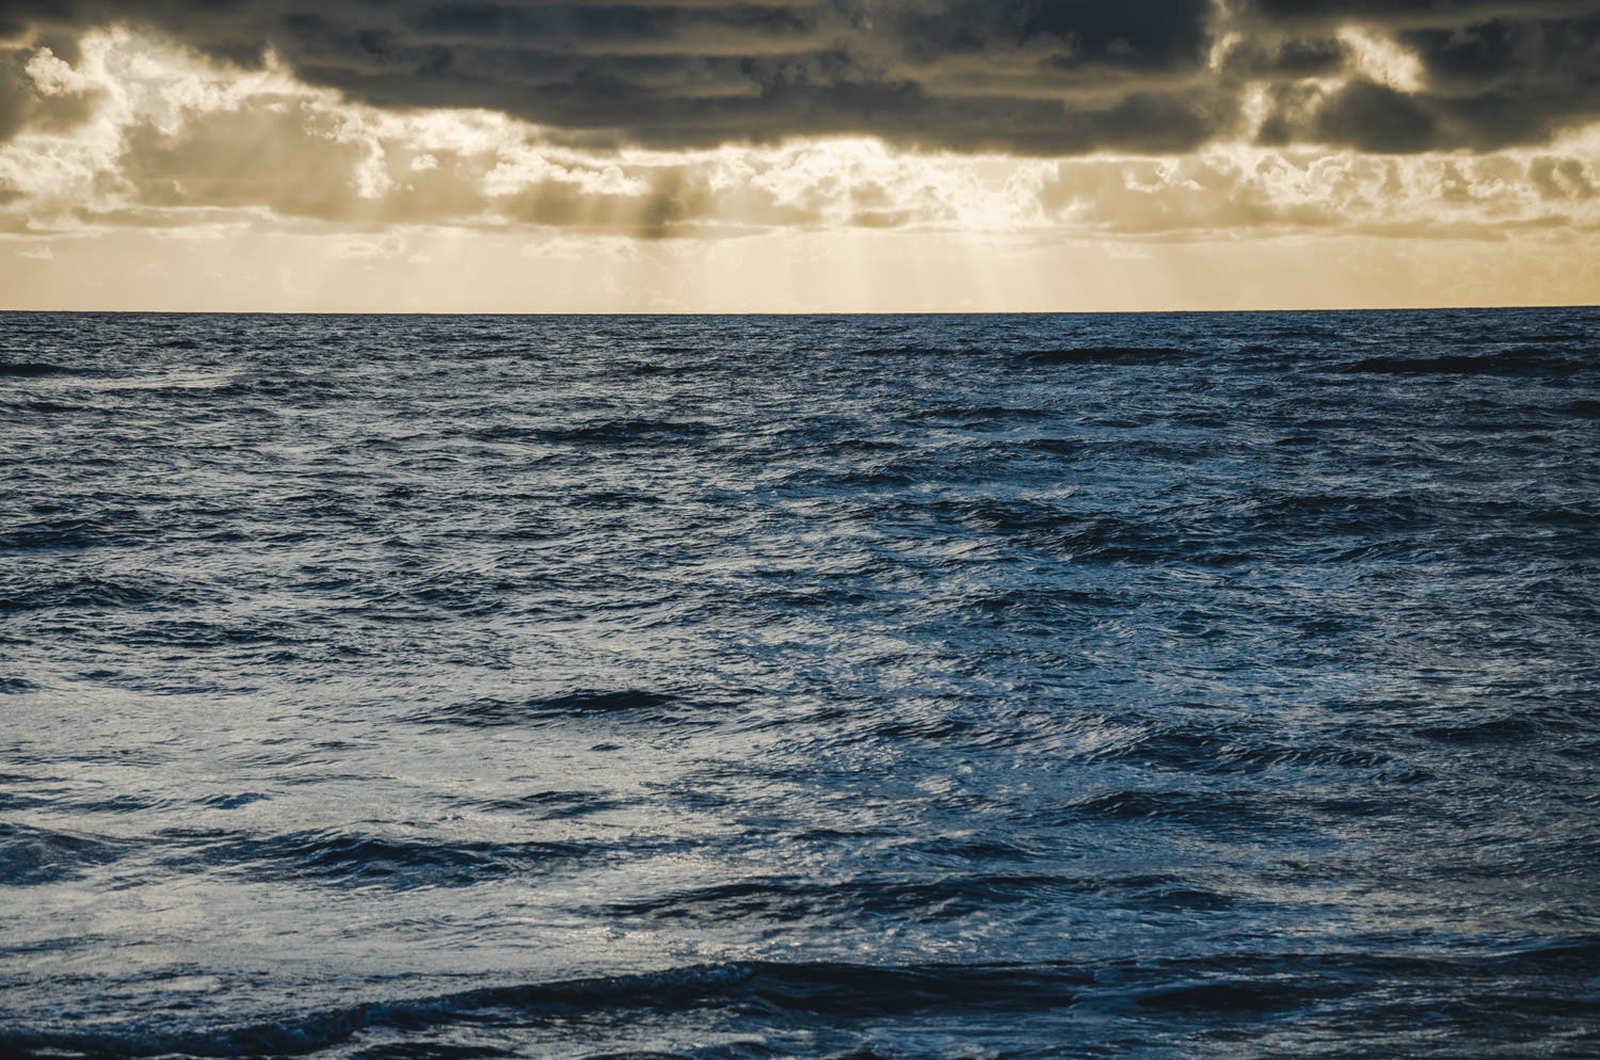 Raylight on the Sea, 2015, da série Across Brazil